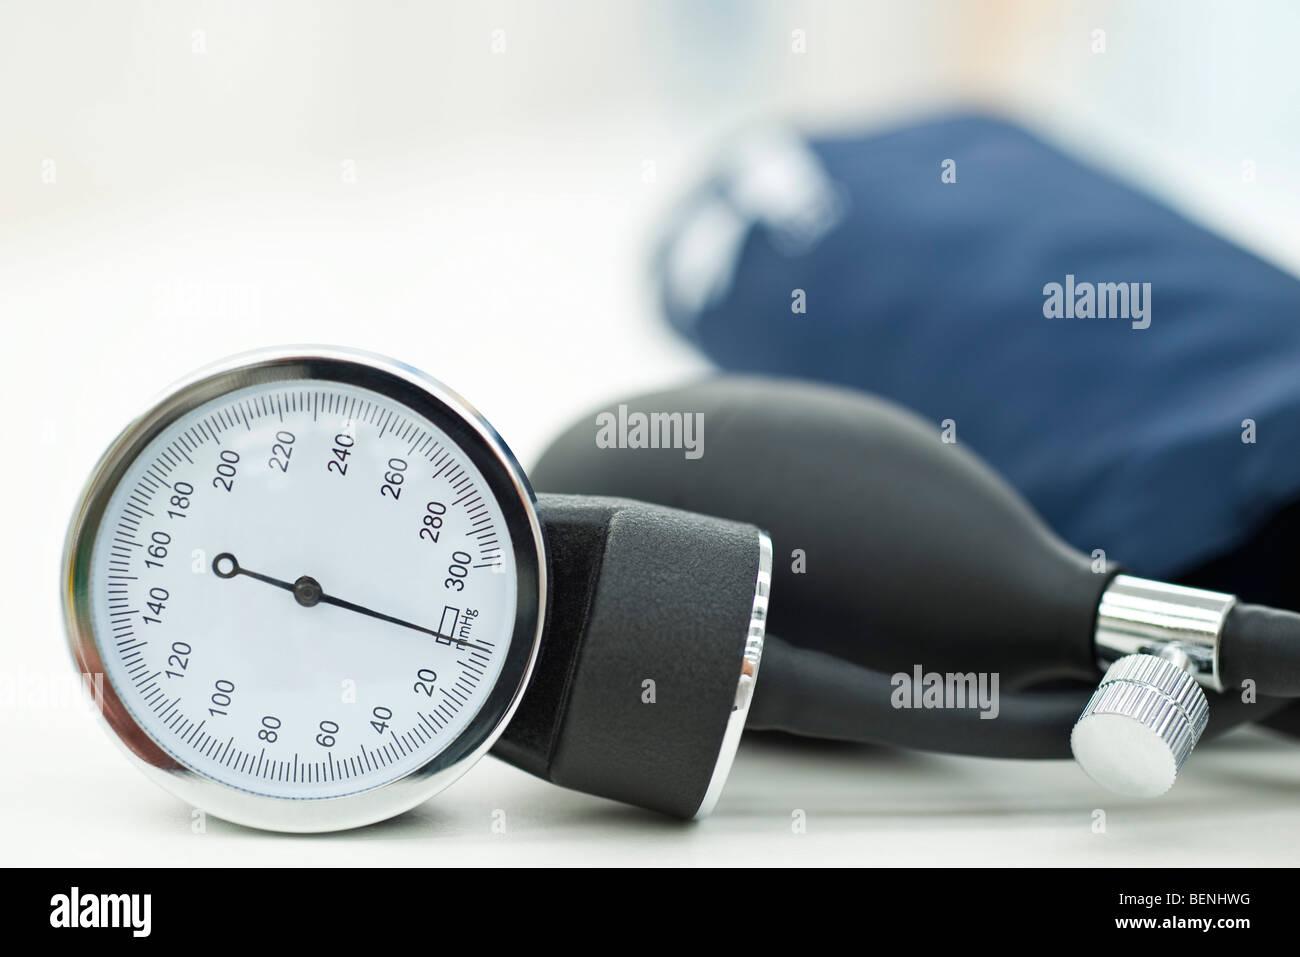 Aneroid sphygmomanometer (blood pressure gauge) - Stock Image